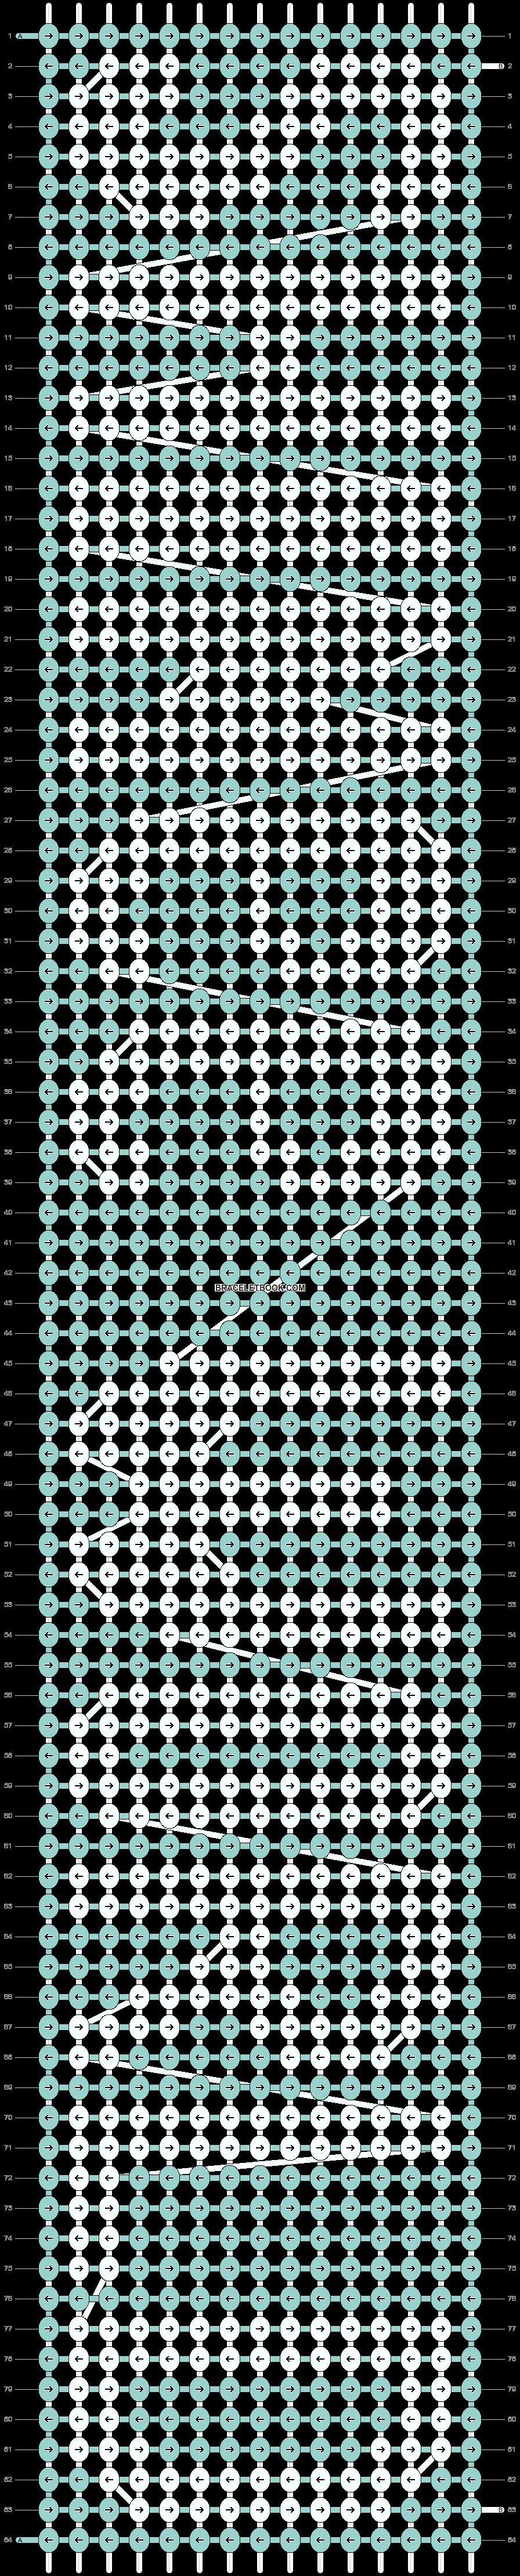 Alpha pattern #7946 pattern